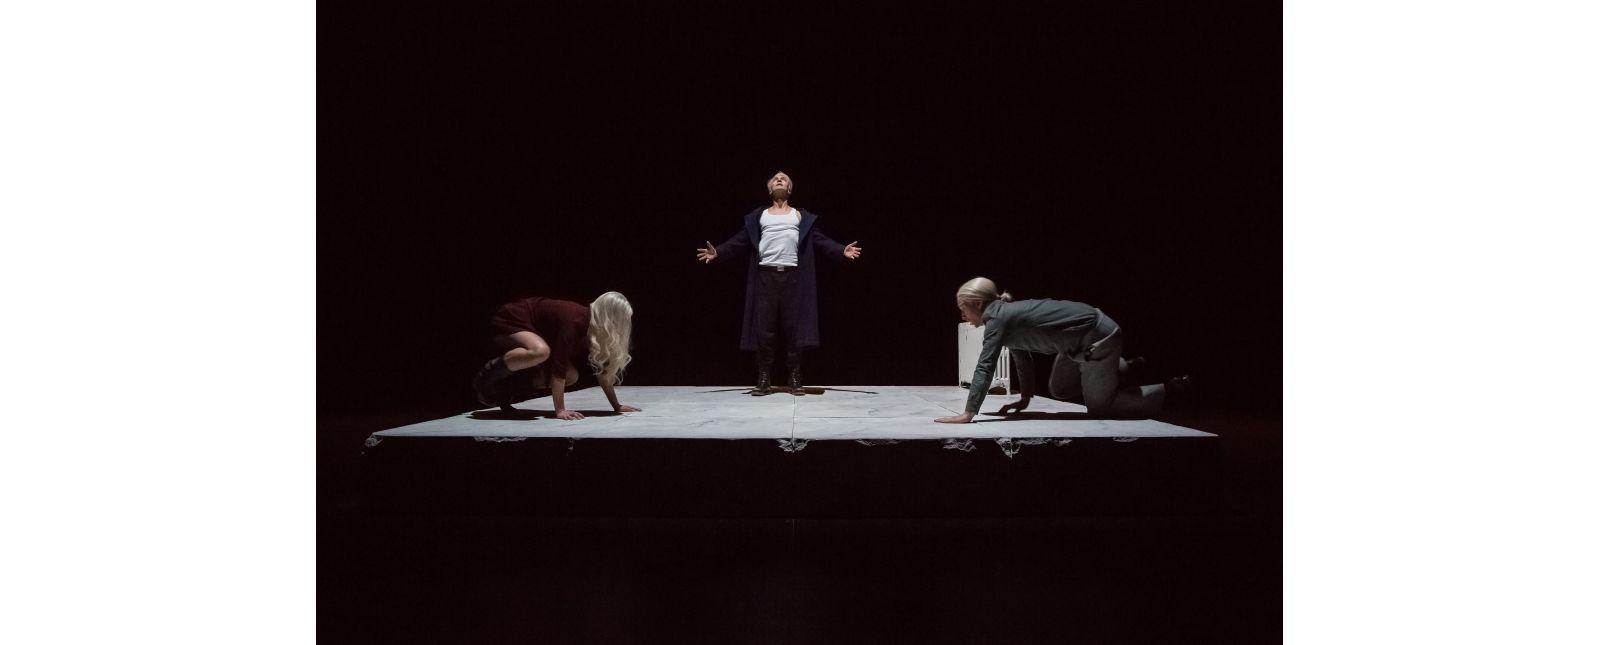 Totentanz // Marieke Kregel, Victor Calero, Martin Hohner // 2017 // Laura Nickel